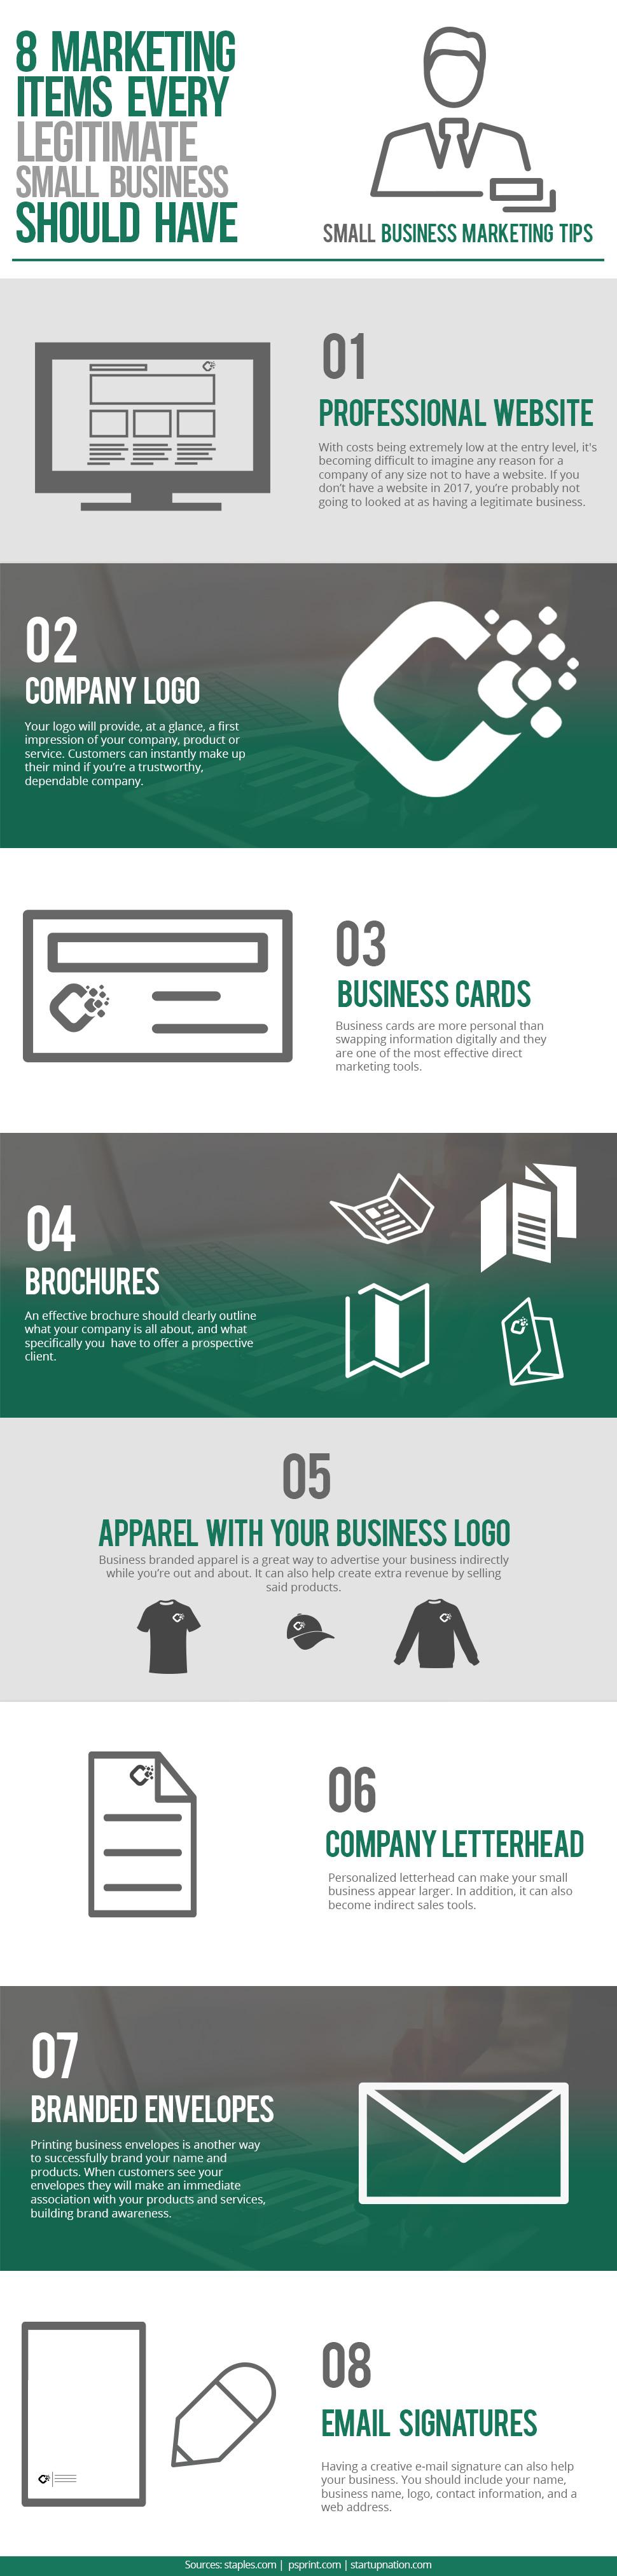 8 Essential Marketing Items